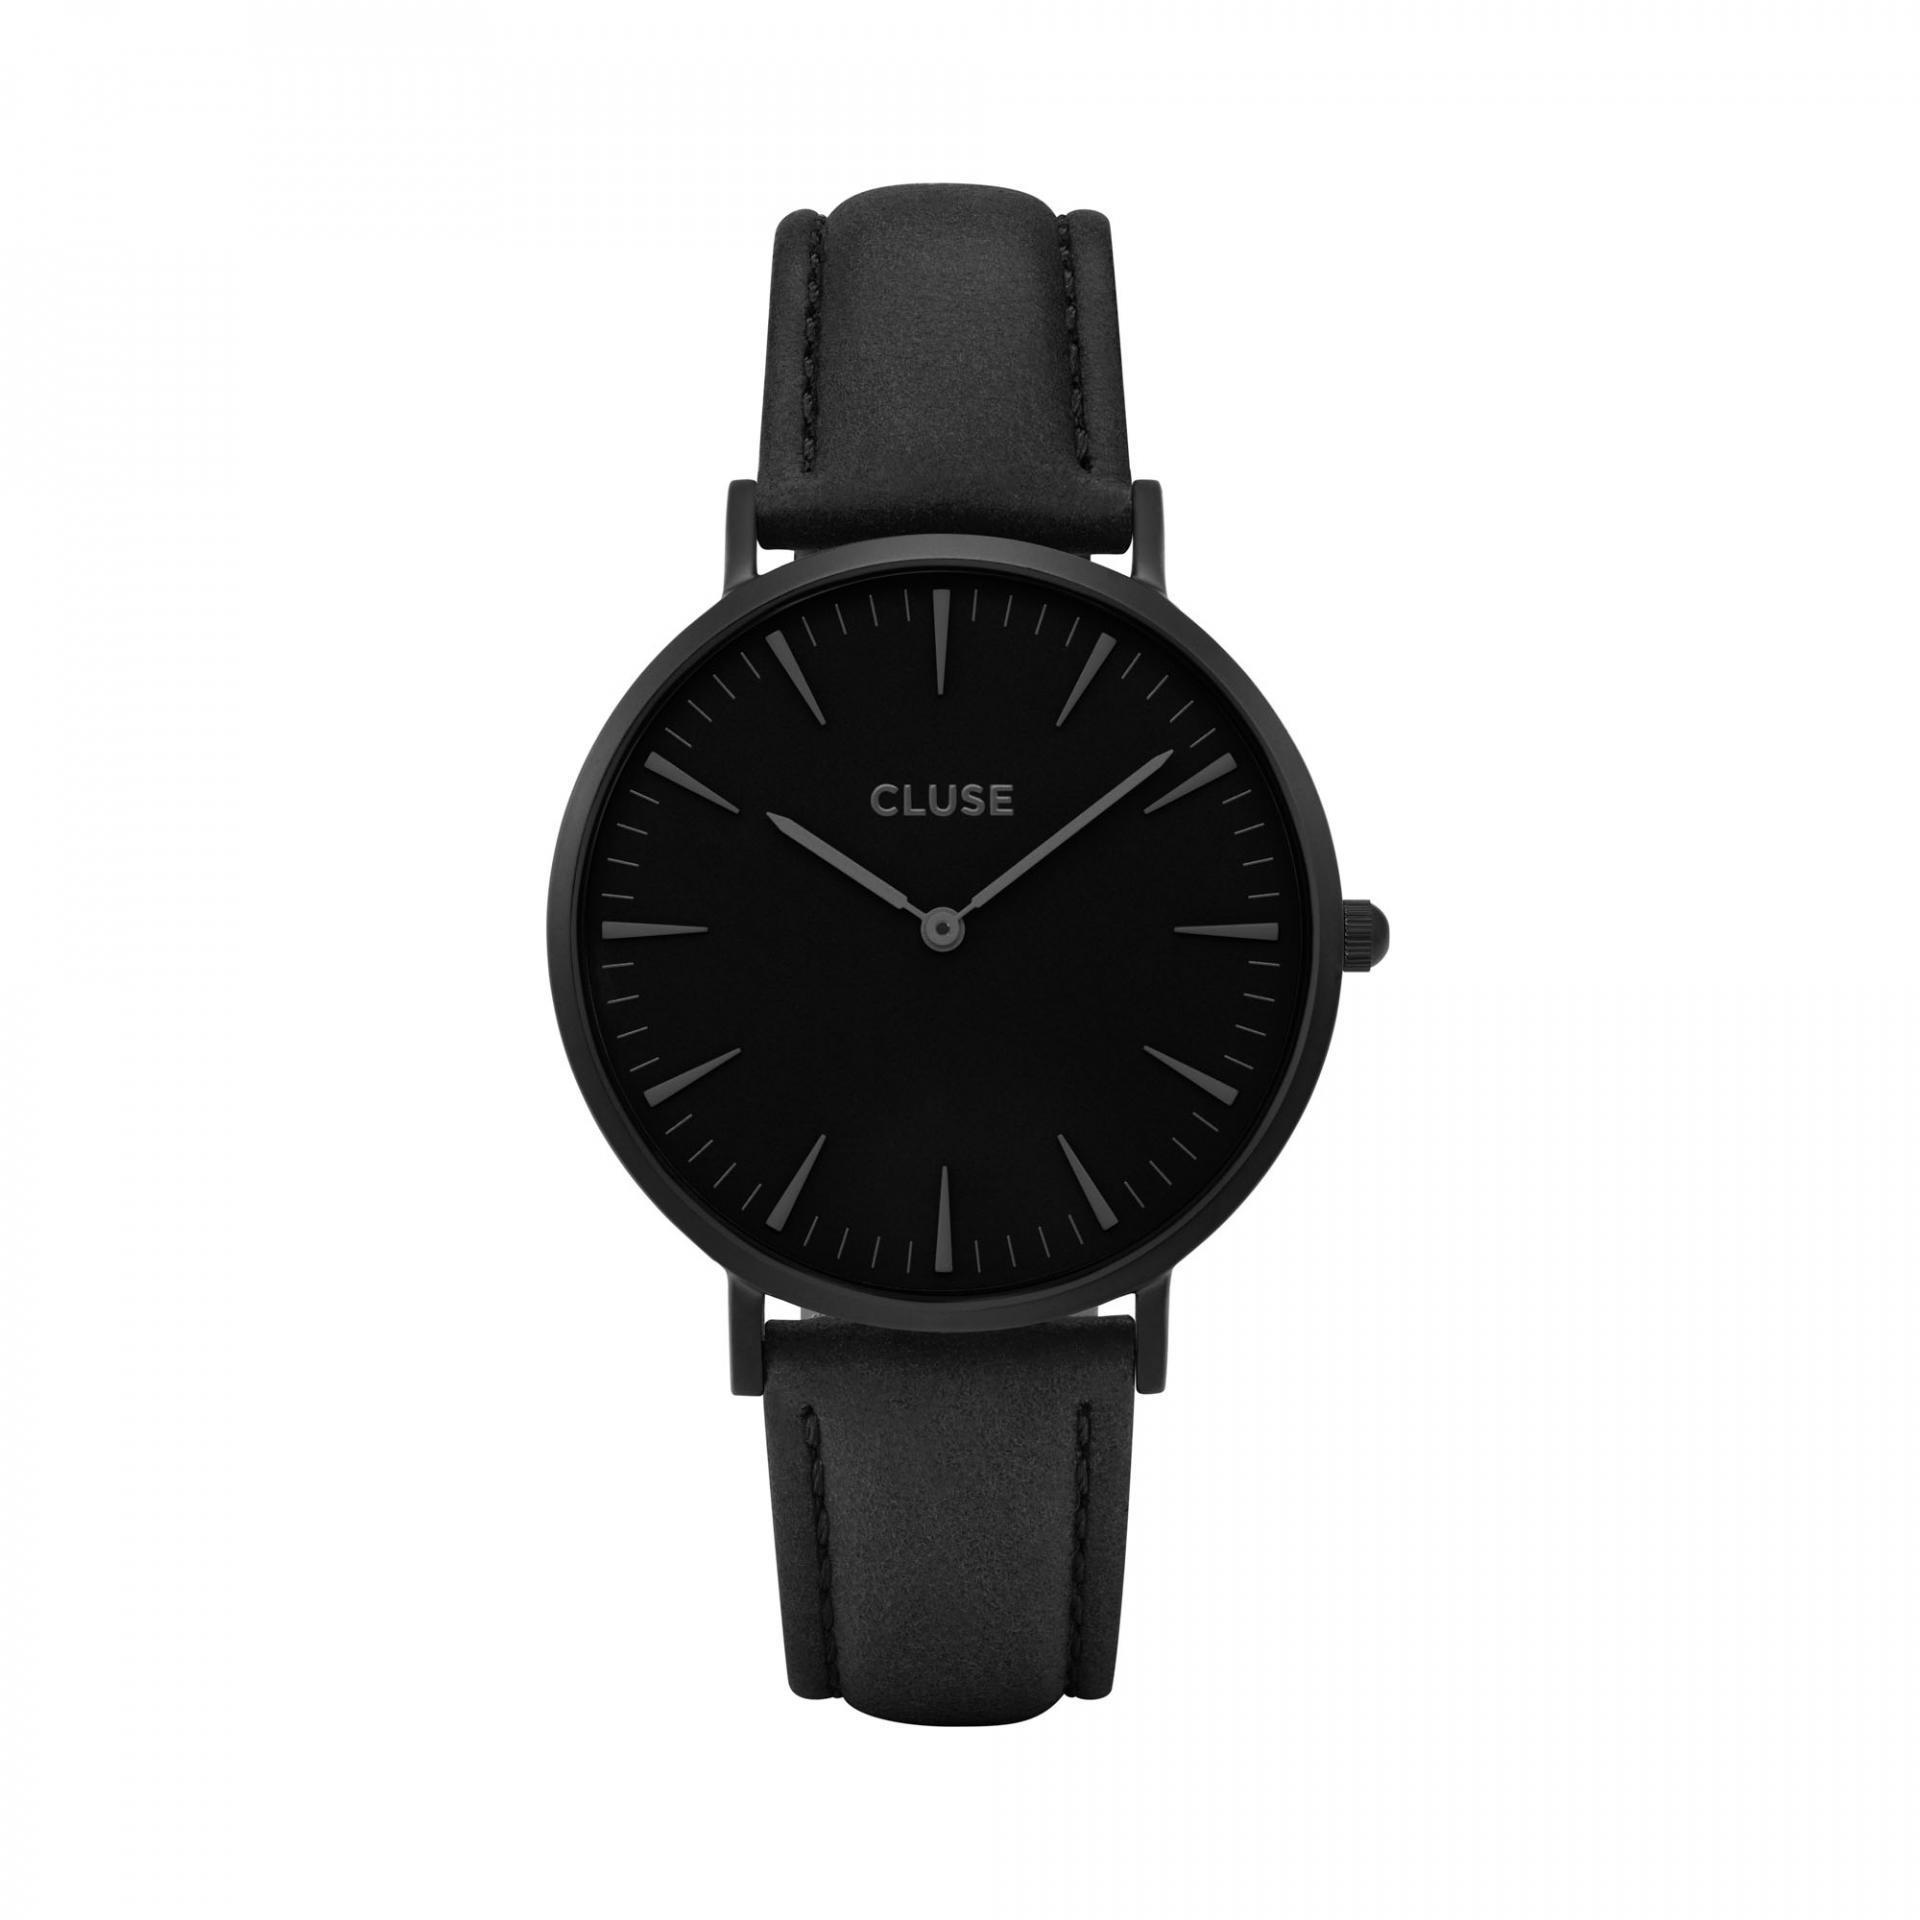 CLUSE Hodinky Cluse La Bohéme Full Black/black, černá barva, sklo, kov, kůže